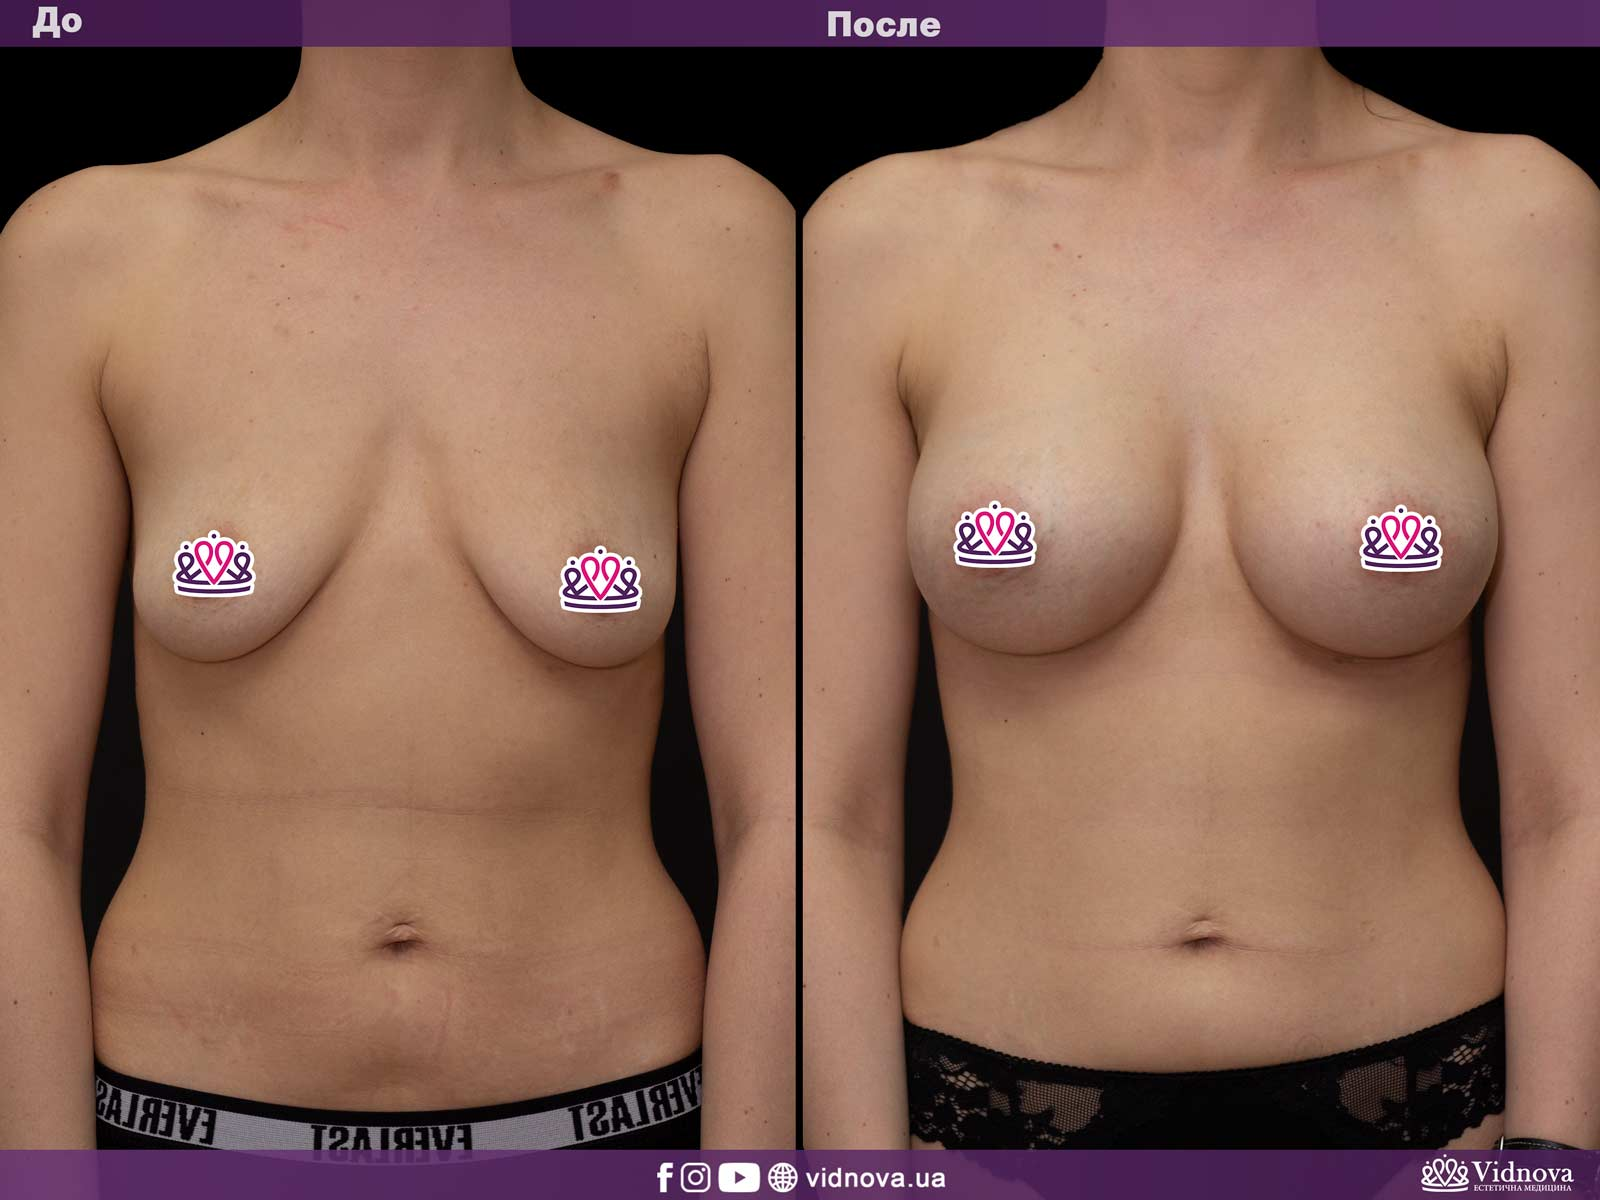 Увеличение груди: Фото ДО и ПОСЛЕ - Пример №12-1 - Клиника Vidnova